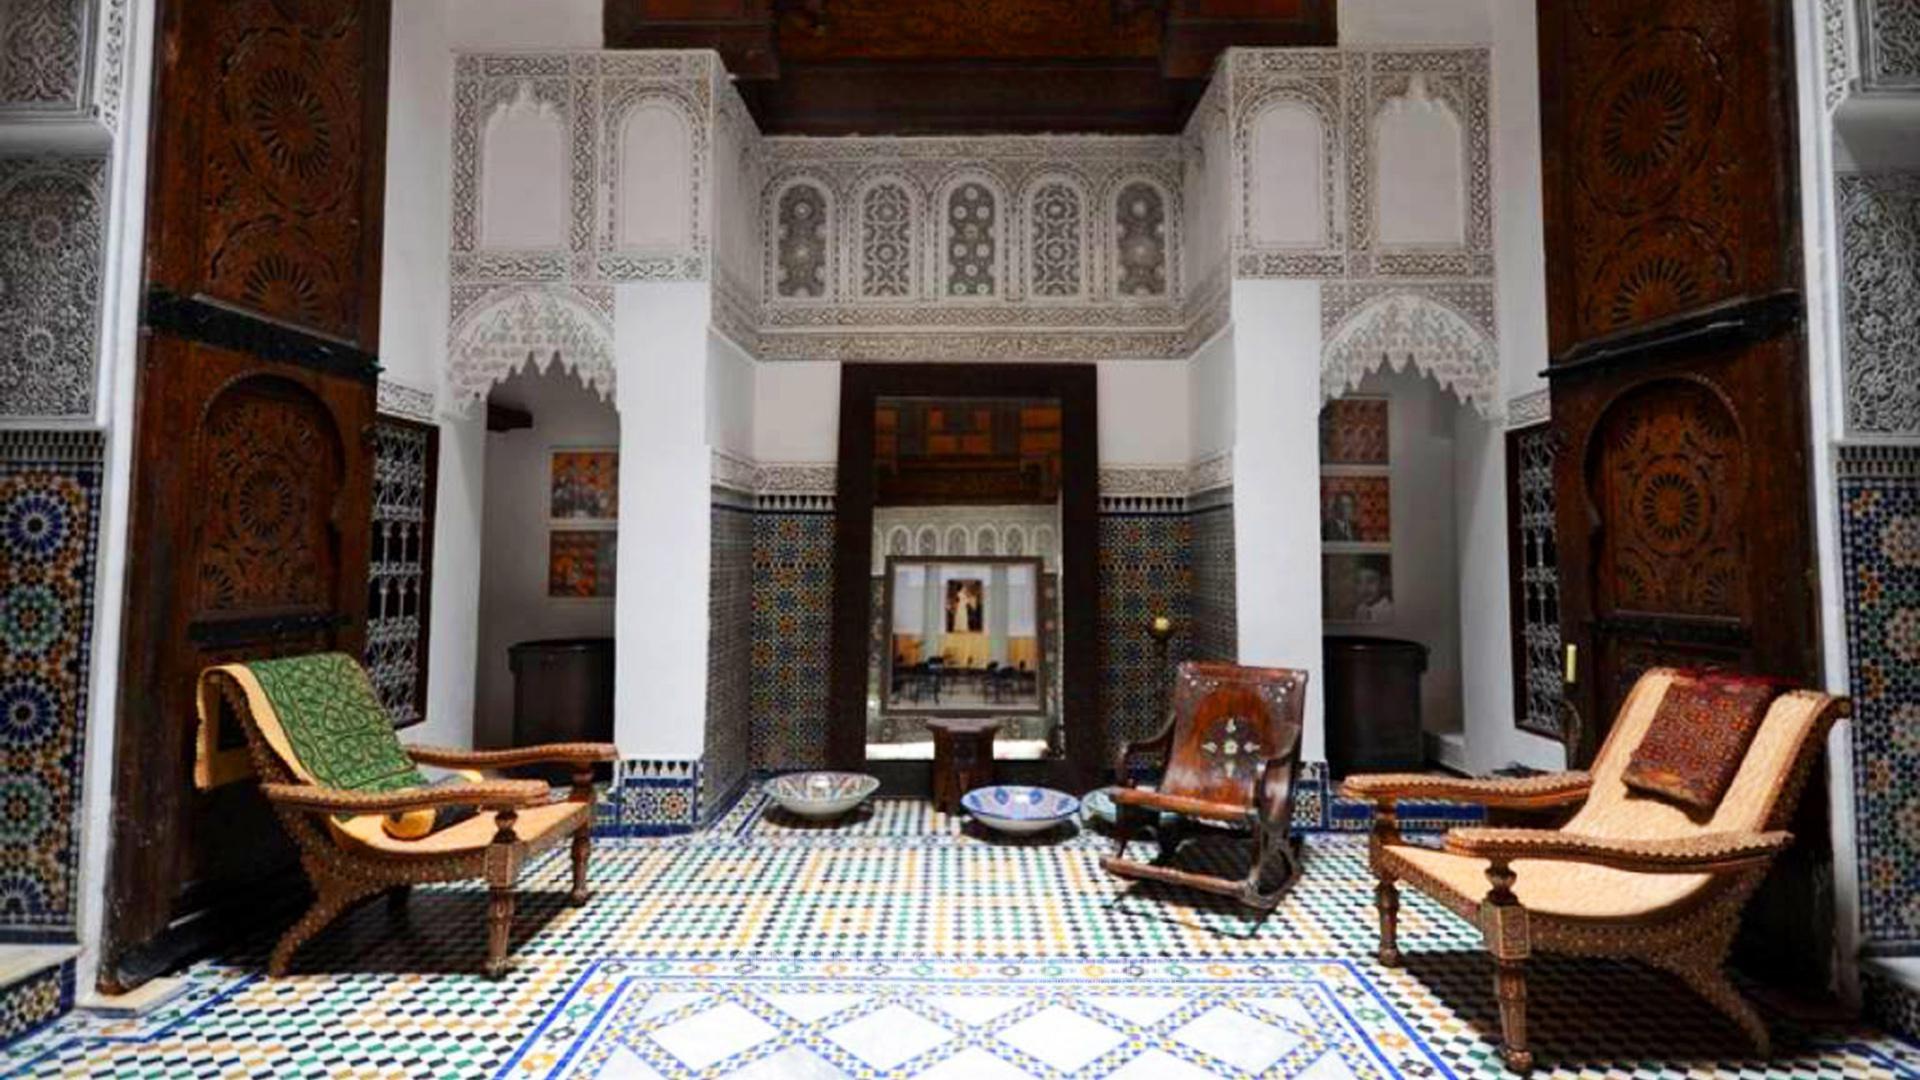 KPPM00538: Riad Fes Riad Fèz Morocco